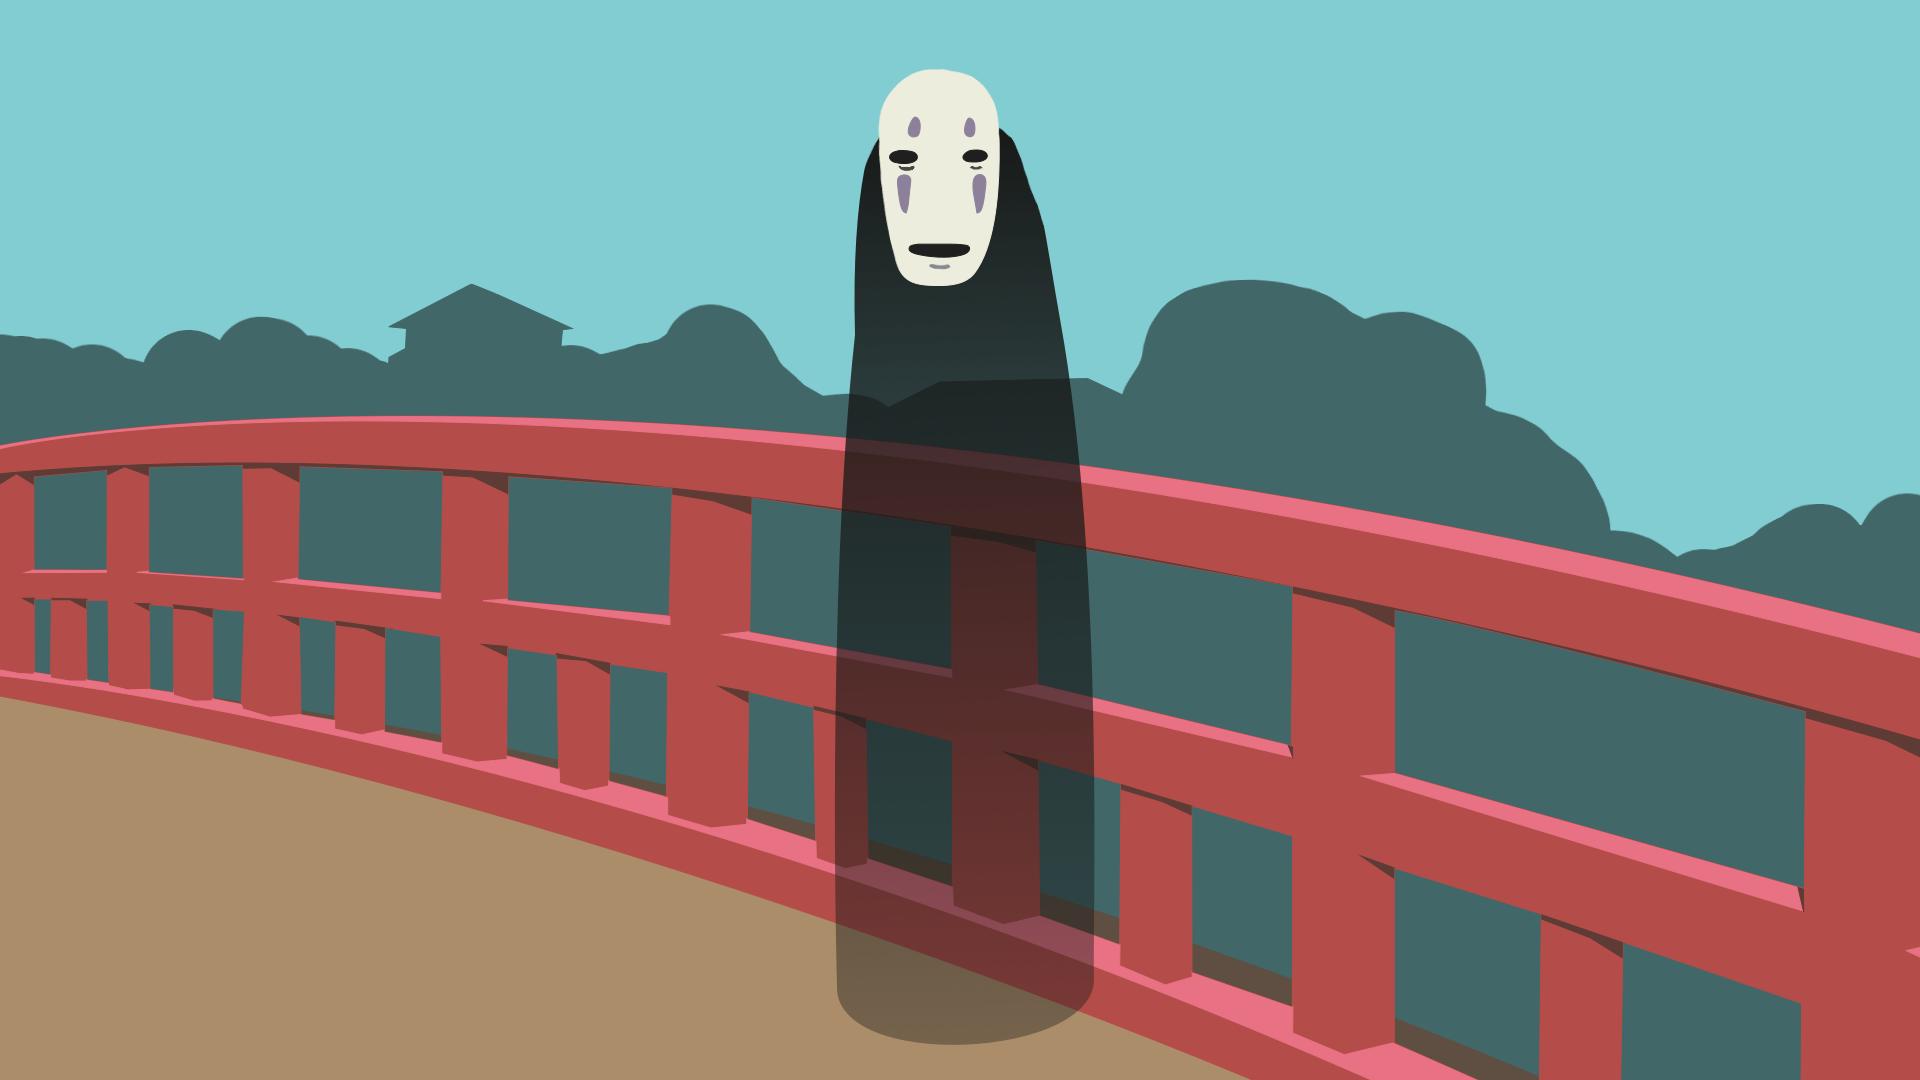 Wallpaper Anime Spirited Away No Face Minimalism Fan Art